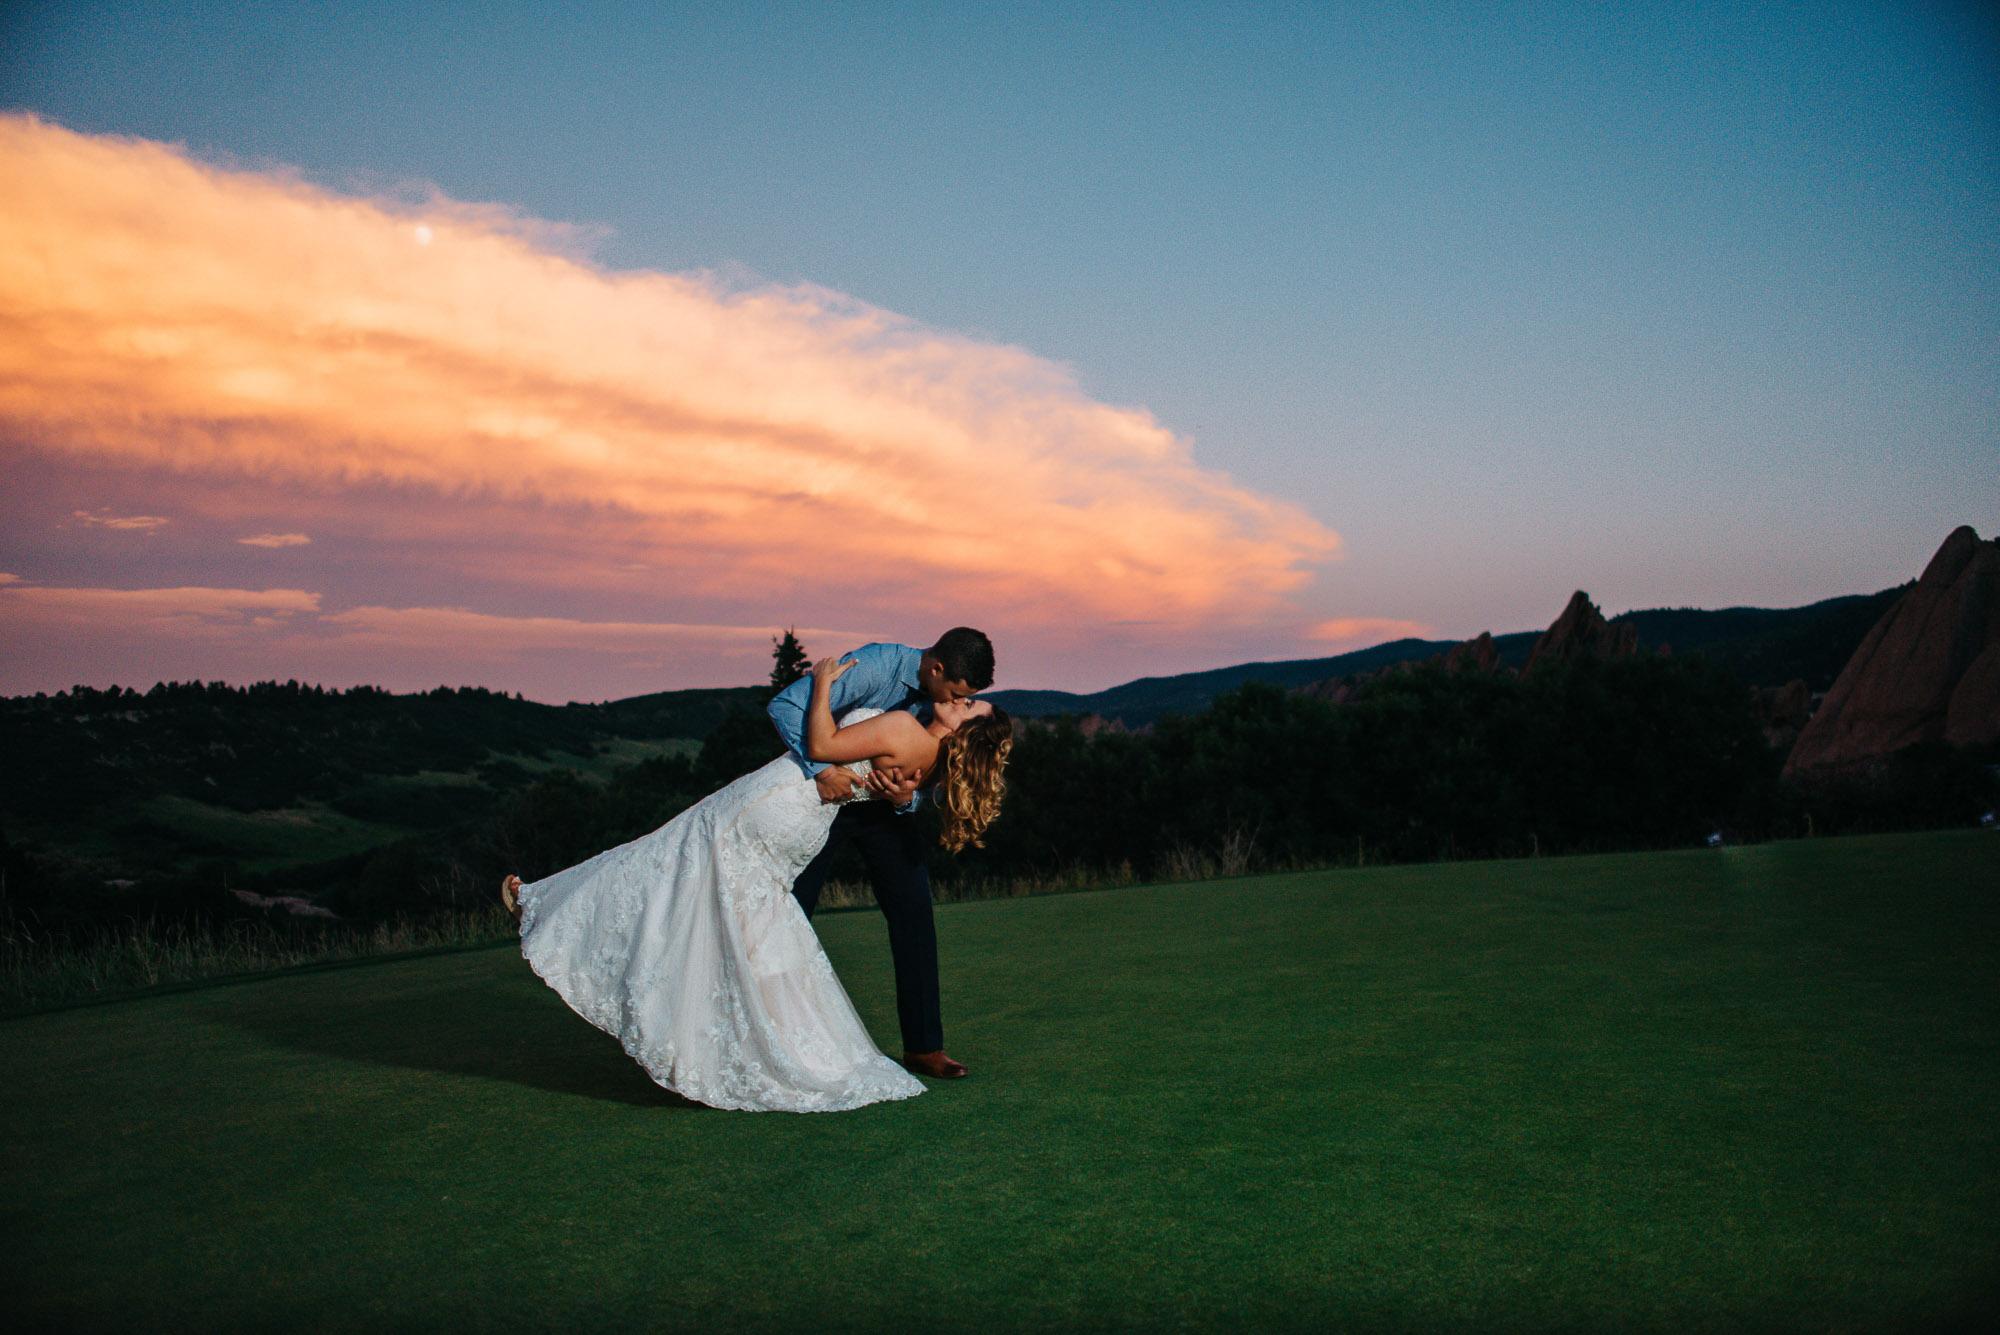 84elopement-photographer-colorado-arrowhead-wedding-jordan&jace-3376.jpg